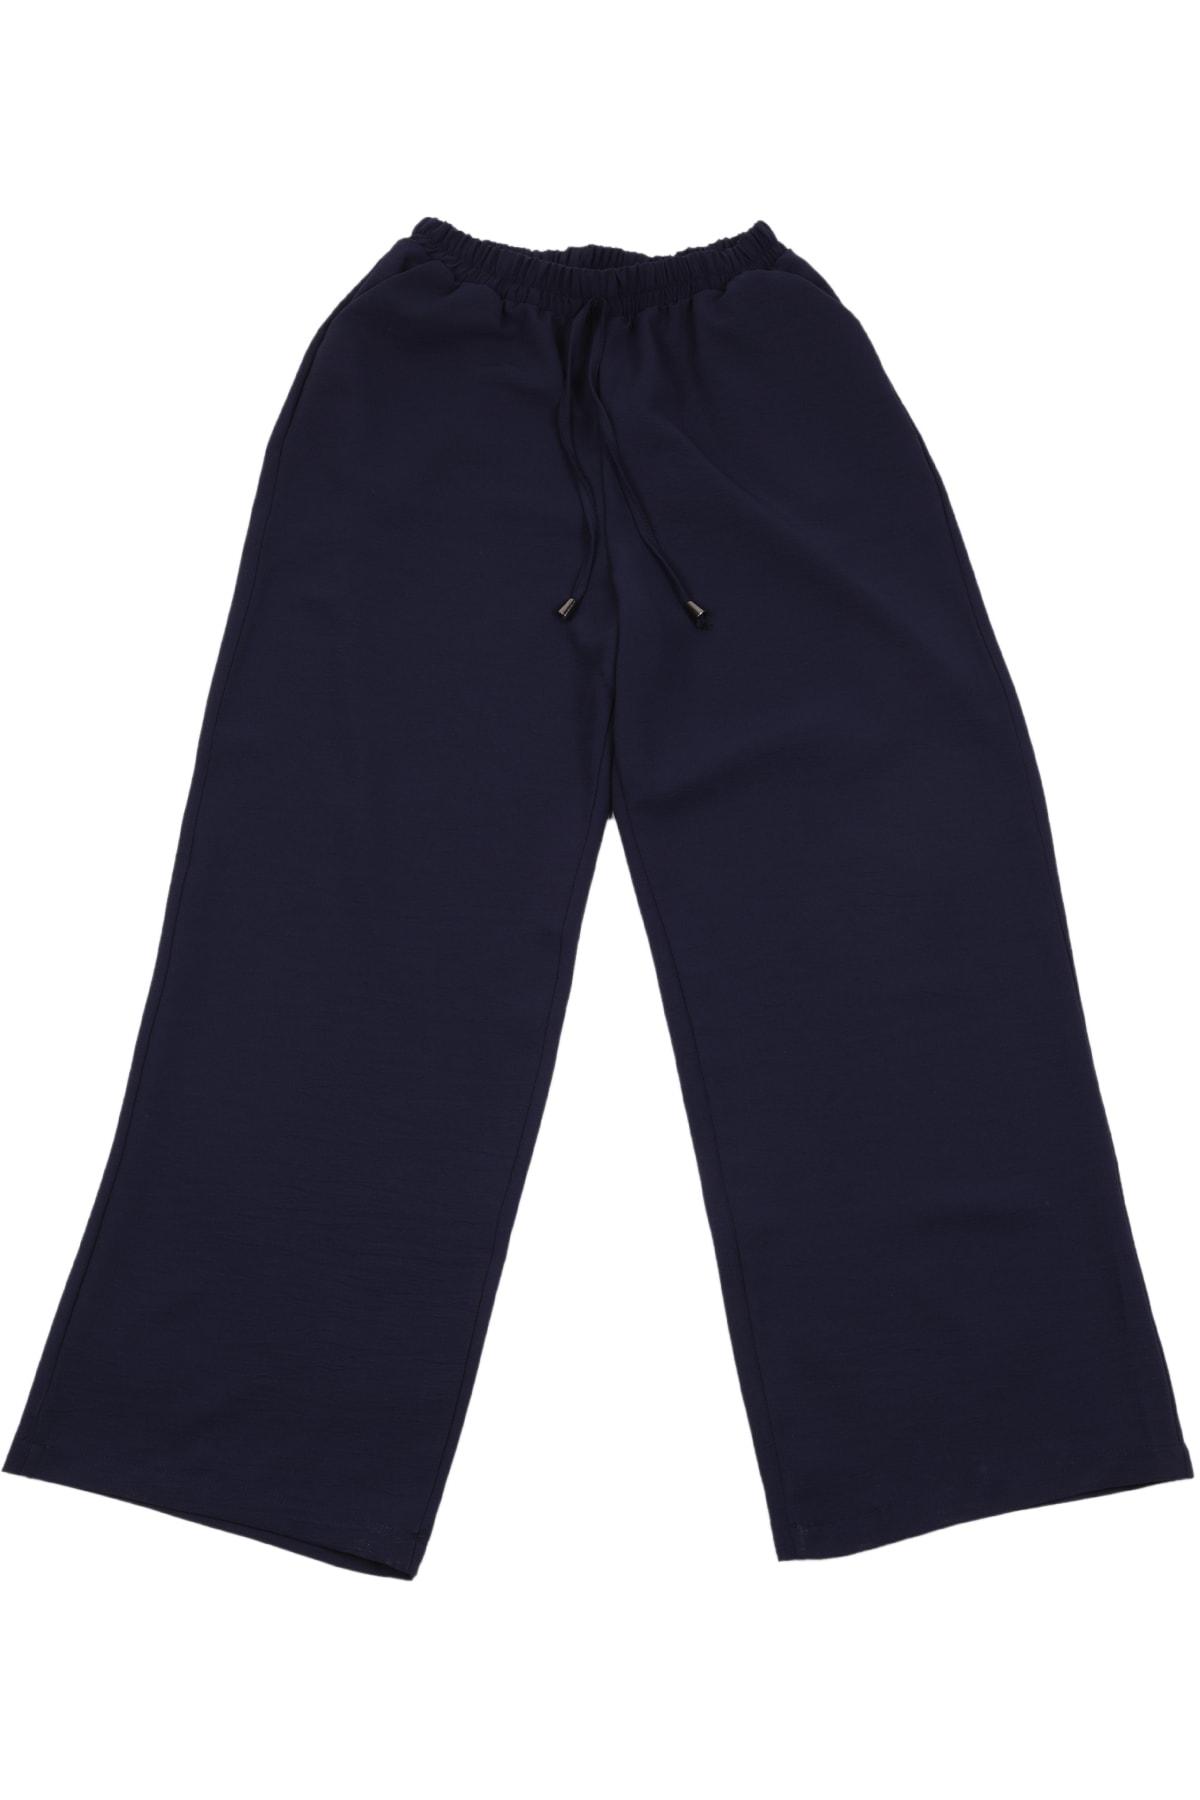 Kadın Lacivert Palazzo Tiril Kumaş Beli Lastikli Geniş Paça Yazlık Pantolon